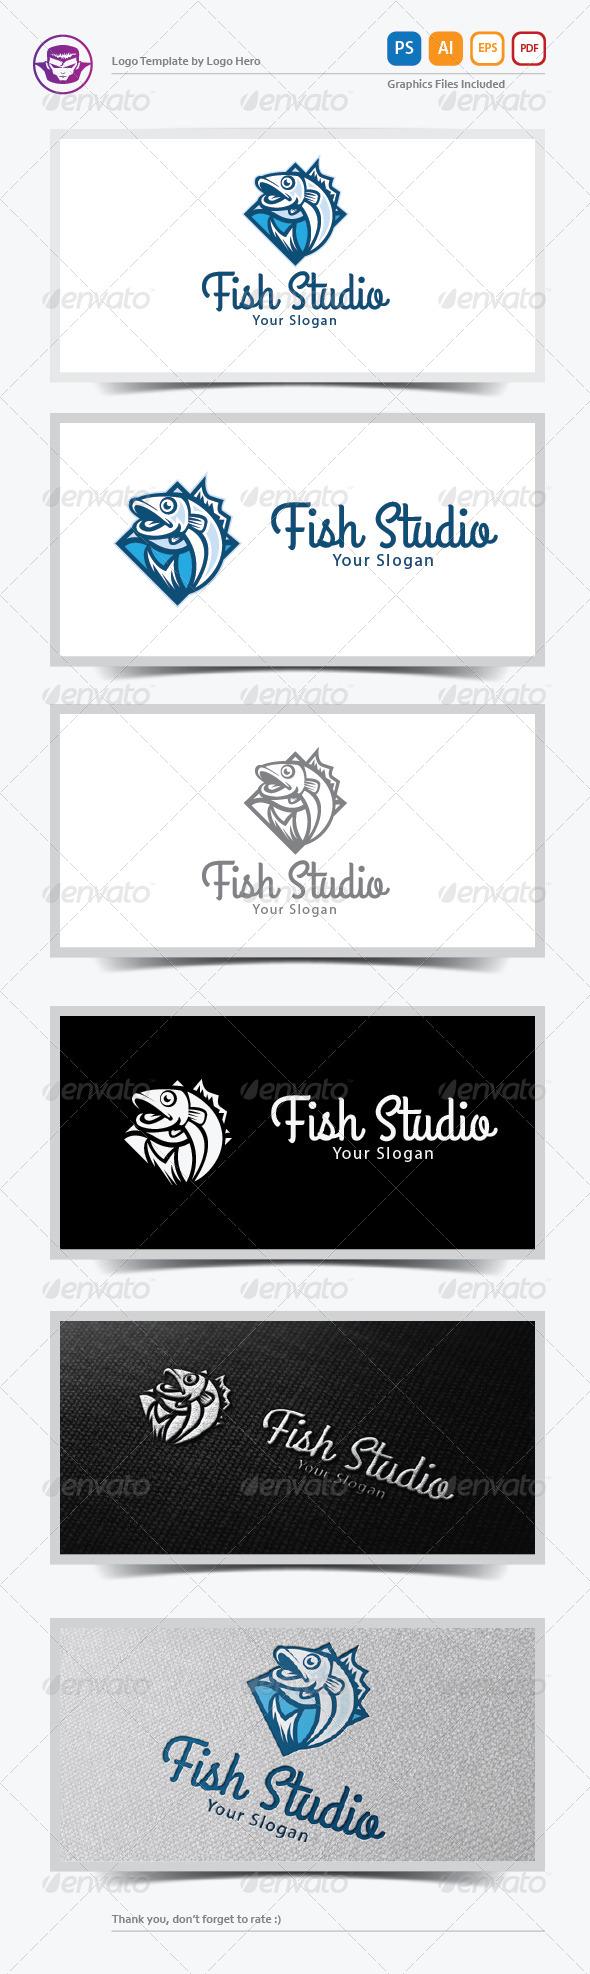 Fish Studio Logo Template - Animals Logo Templates